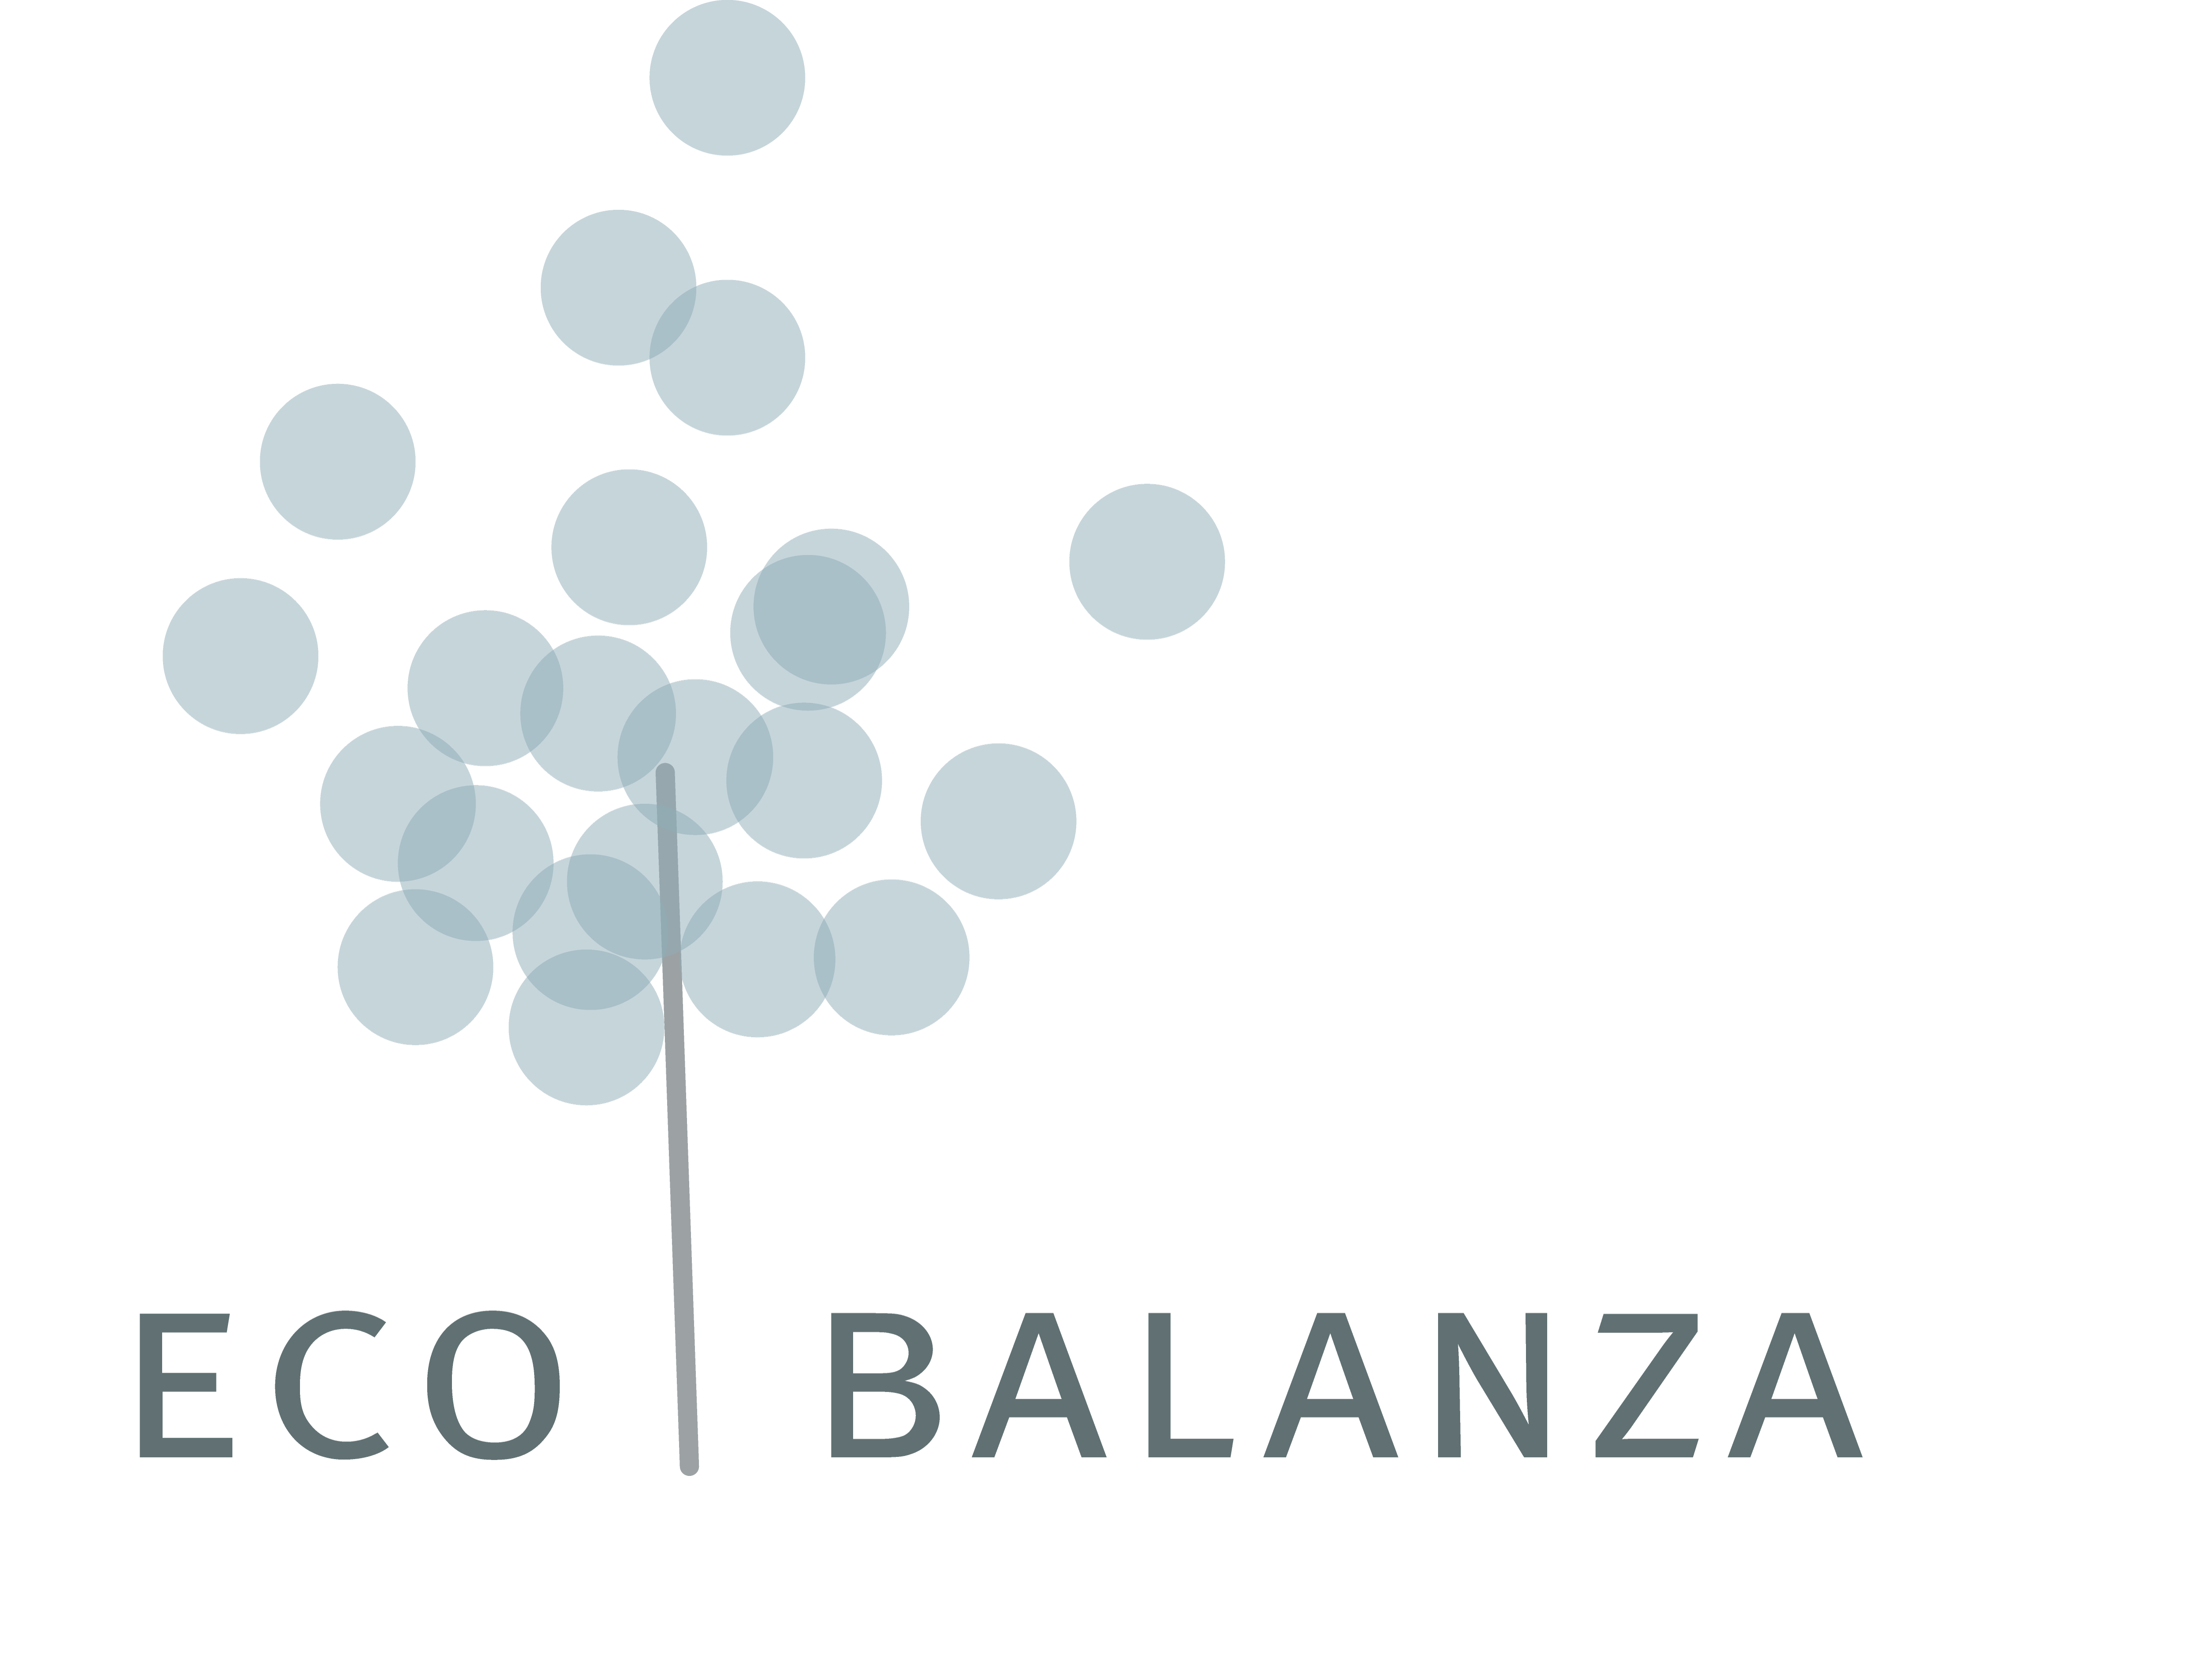 EcoBalanza